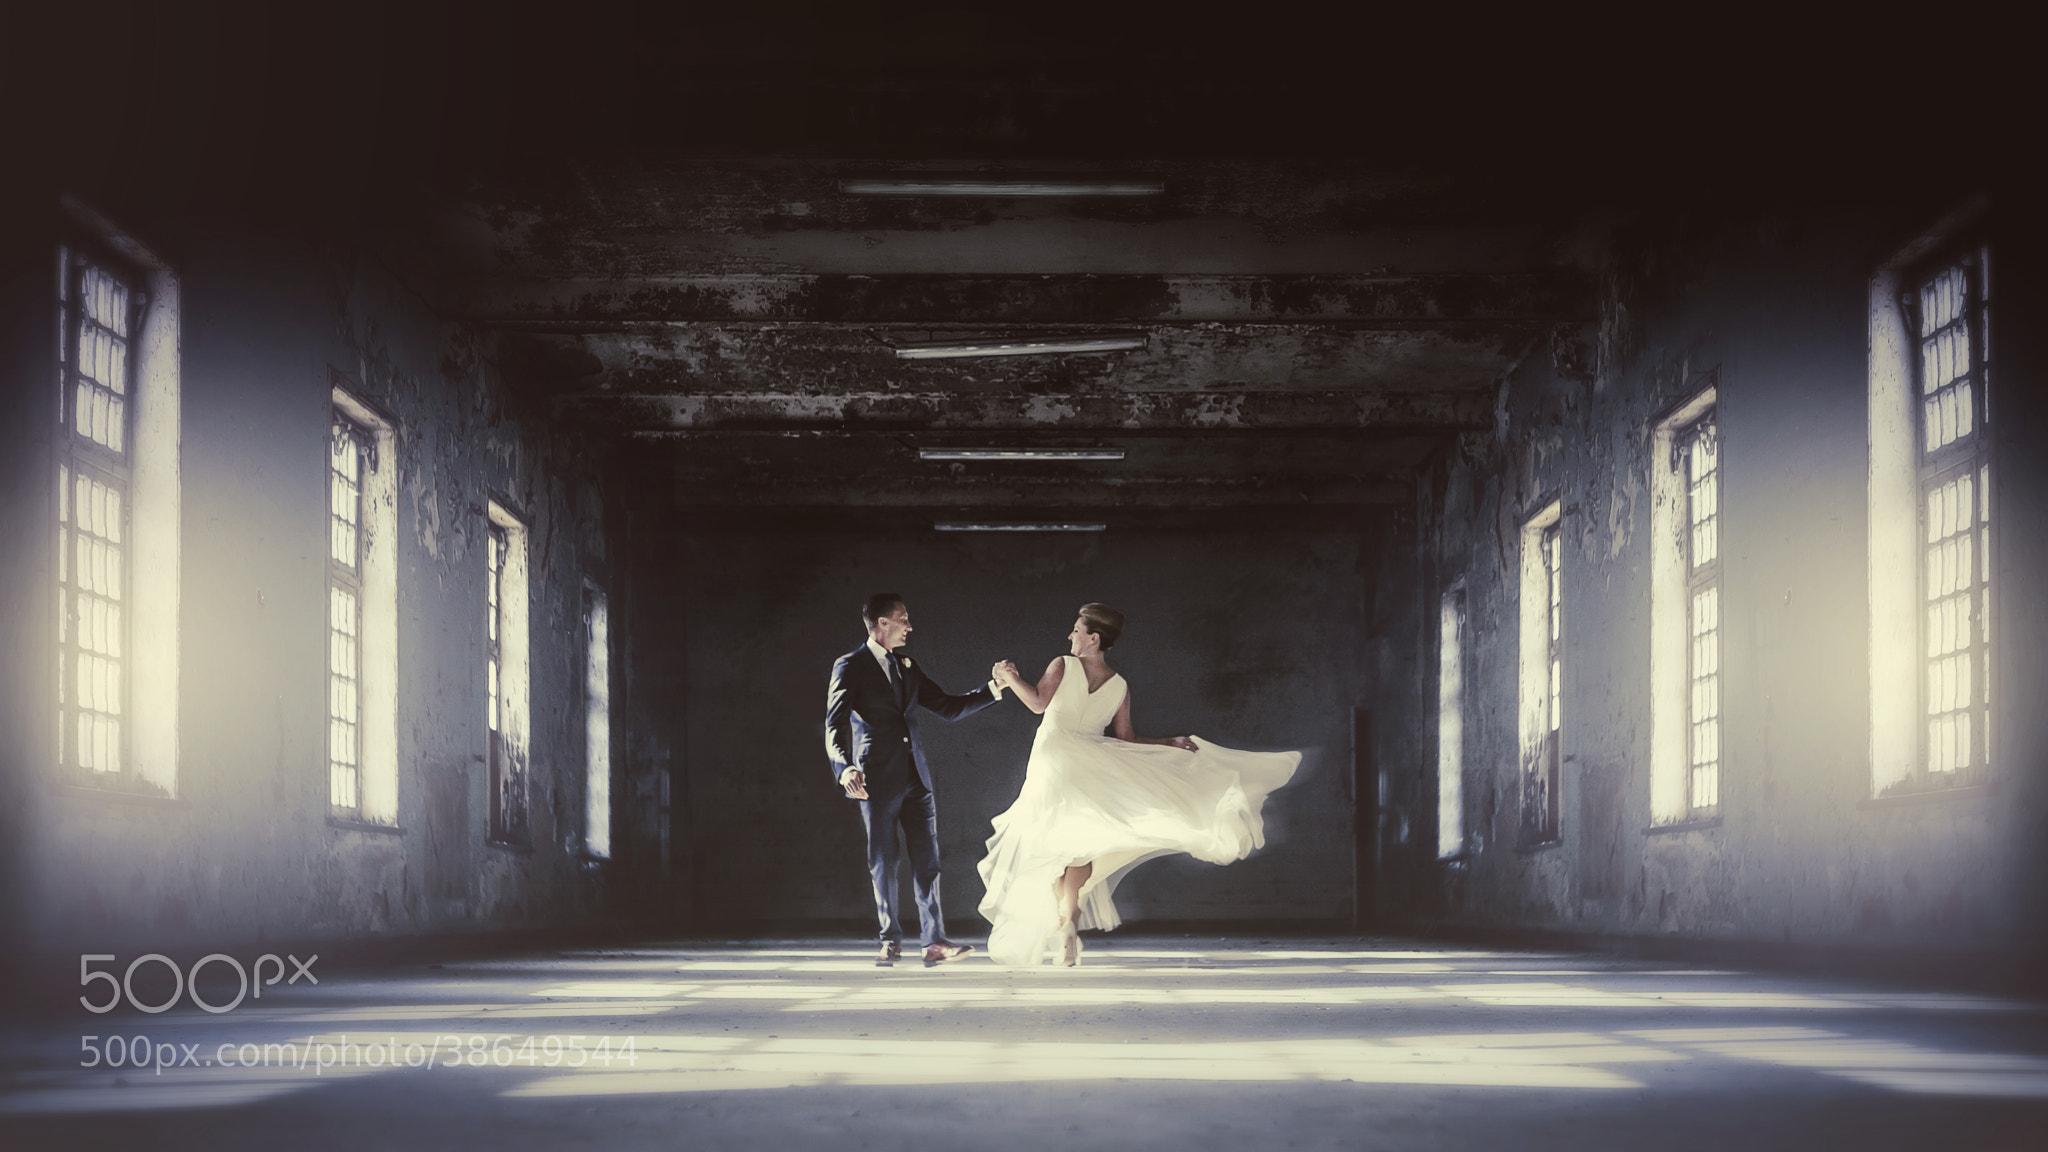 Photograph First Dance by Kurt Vandeweerdt on 500px